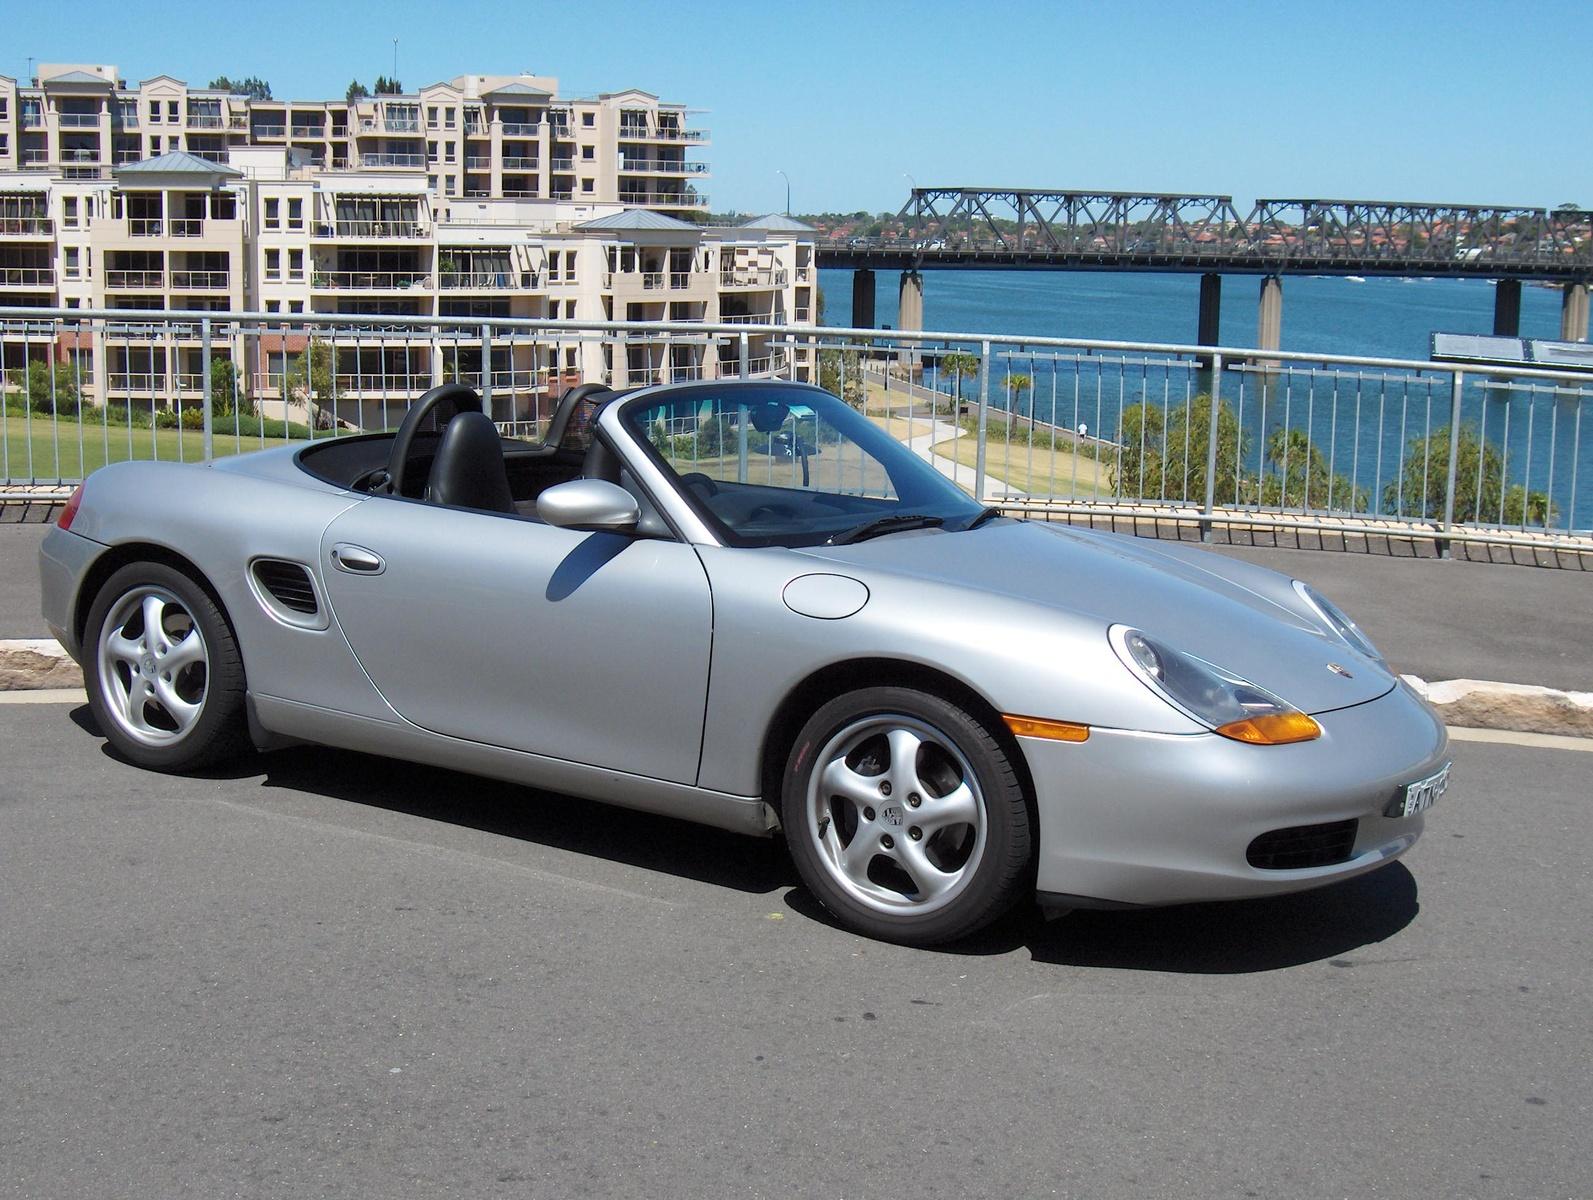 1998 Porsche Boxster Pictures Cargurus